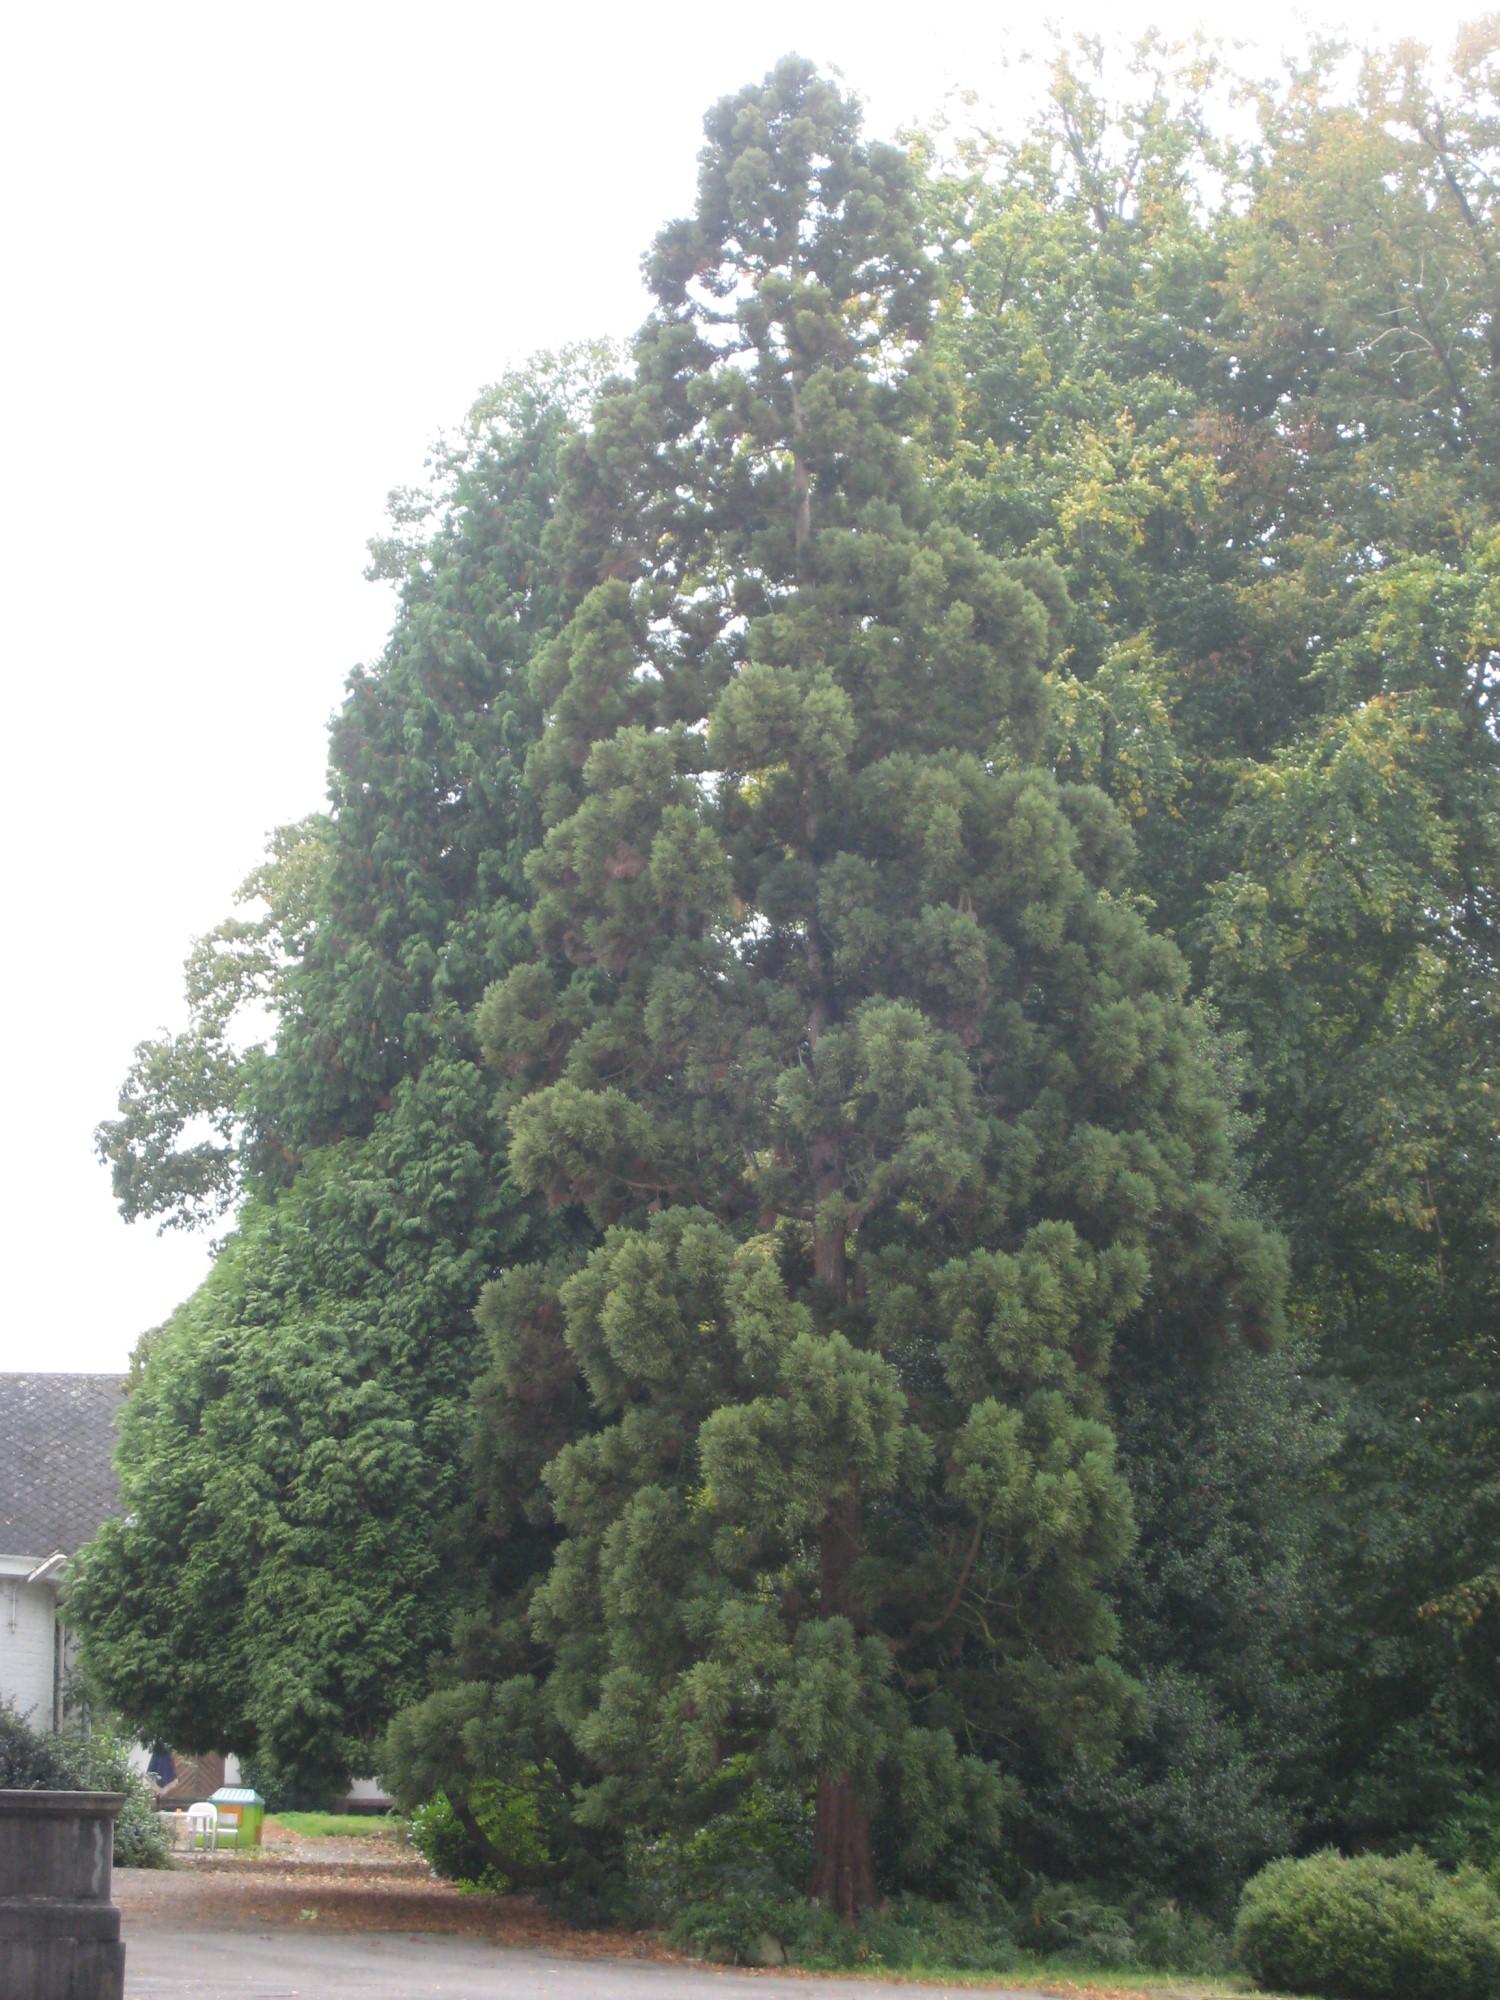 Japanse ceder – St.- Pieters - Woluwe, Park van het Manoir d'Anjou, parc privé –  27 September 2007